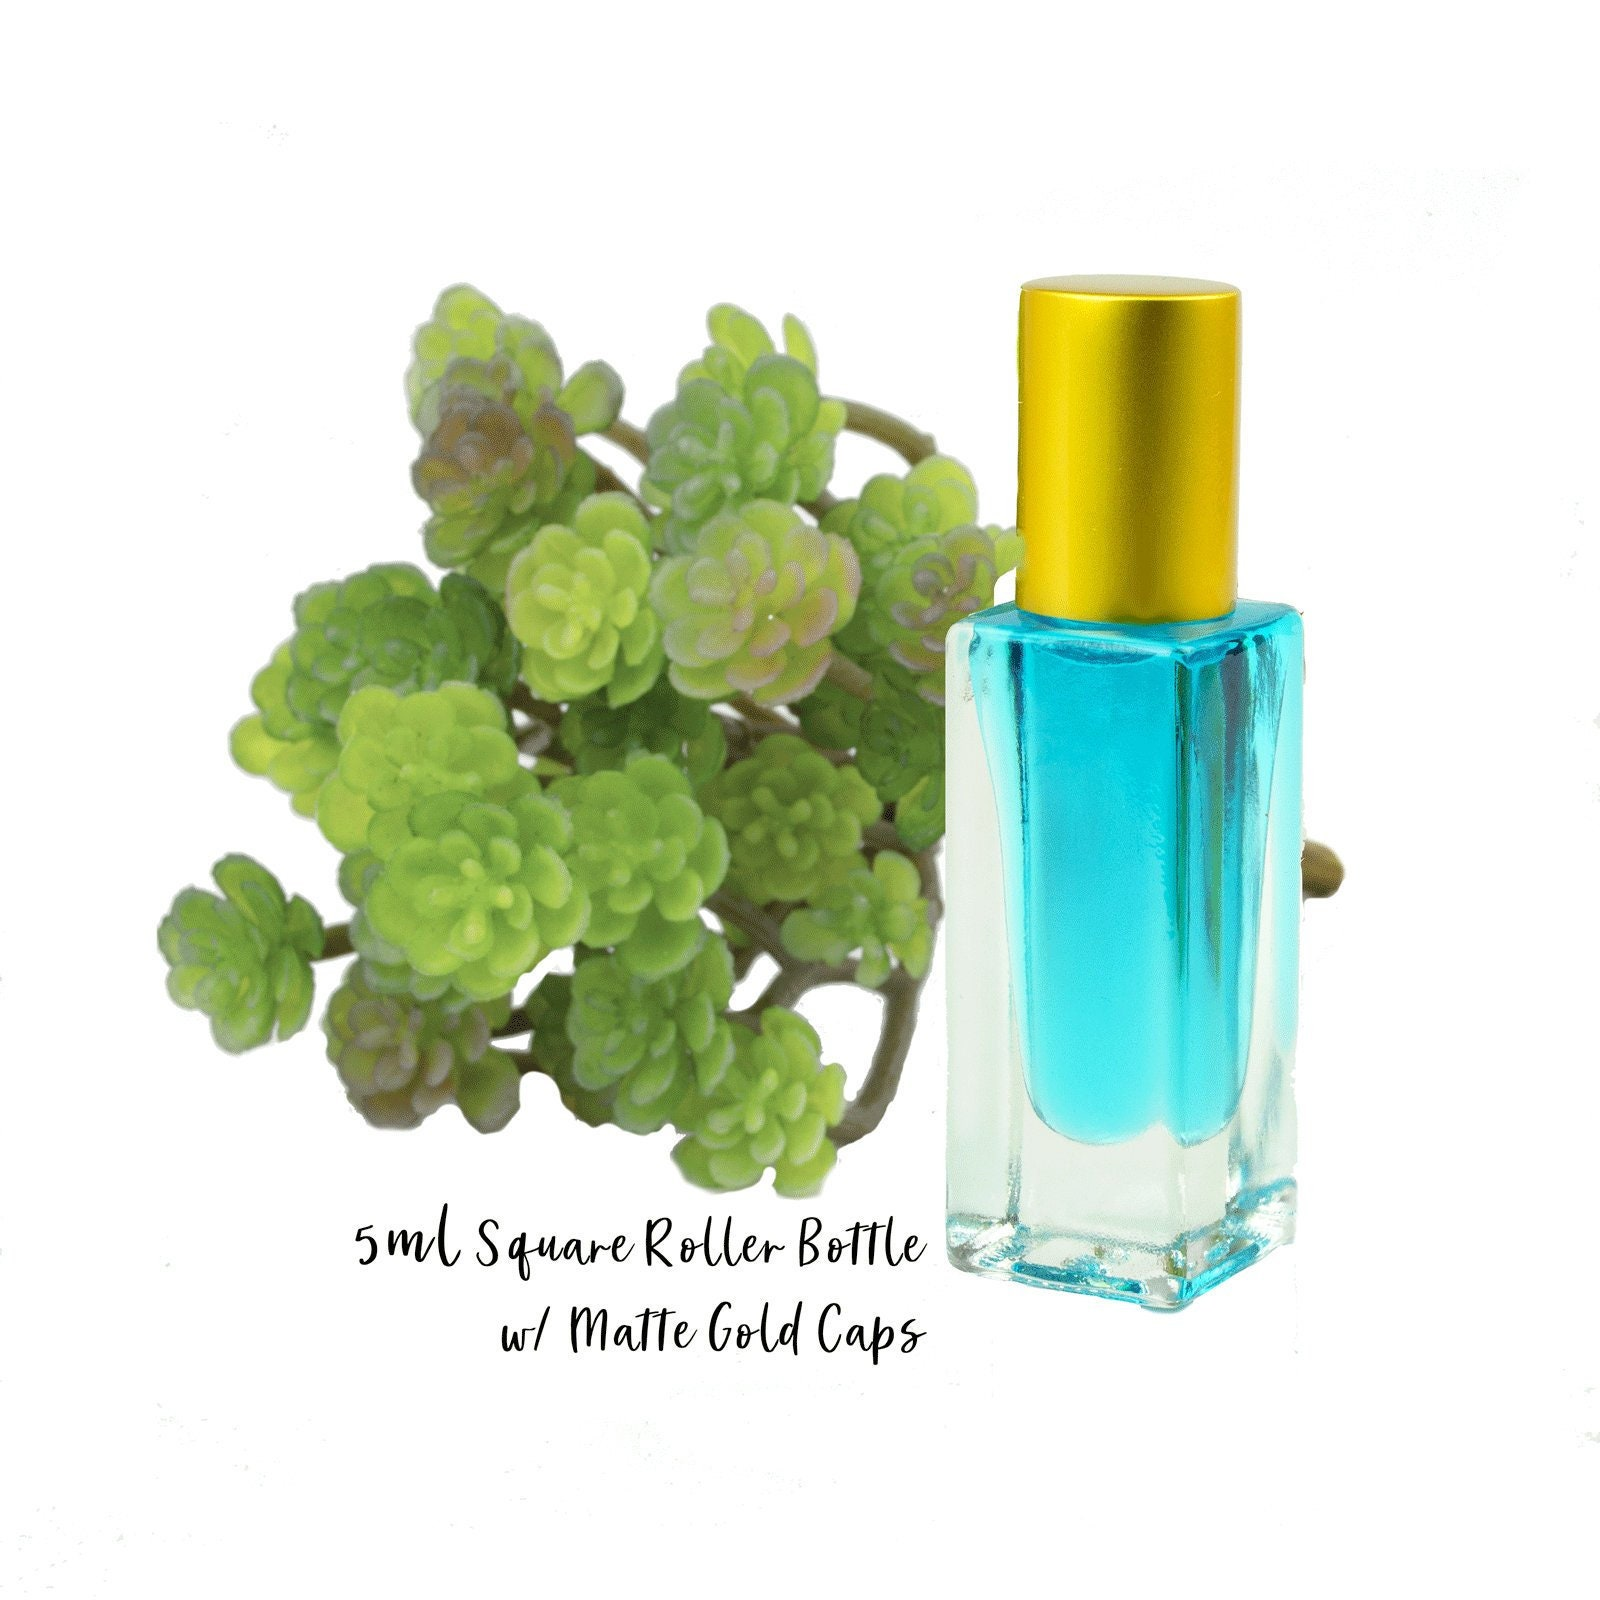 30732f8e04d6 5 ml SQUARE Roller Bottle, Essential Oil 5ml Clear Glass Roller, Gold Caps  Perfume Bottles STEEL Balls, 1/6 Oz Essential Oil Blends, 5 ml